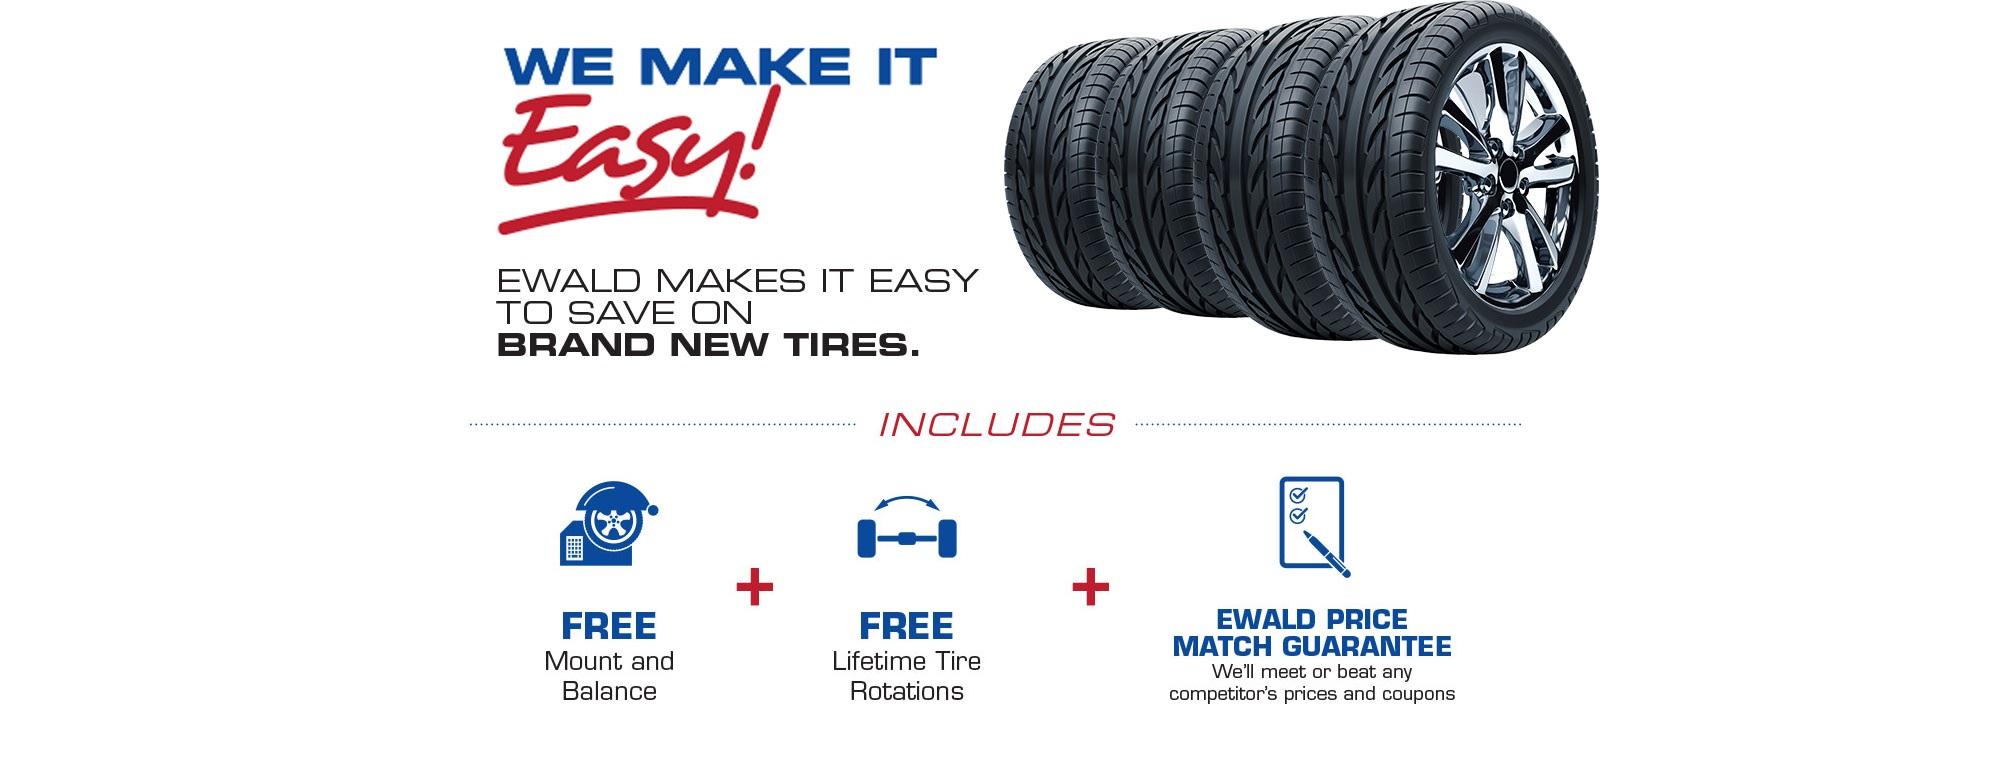 Save On Tires With Ewald Chrysler Jeep Dodge Ram Ewald Cjdr